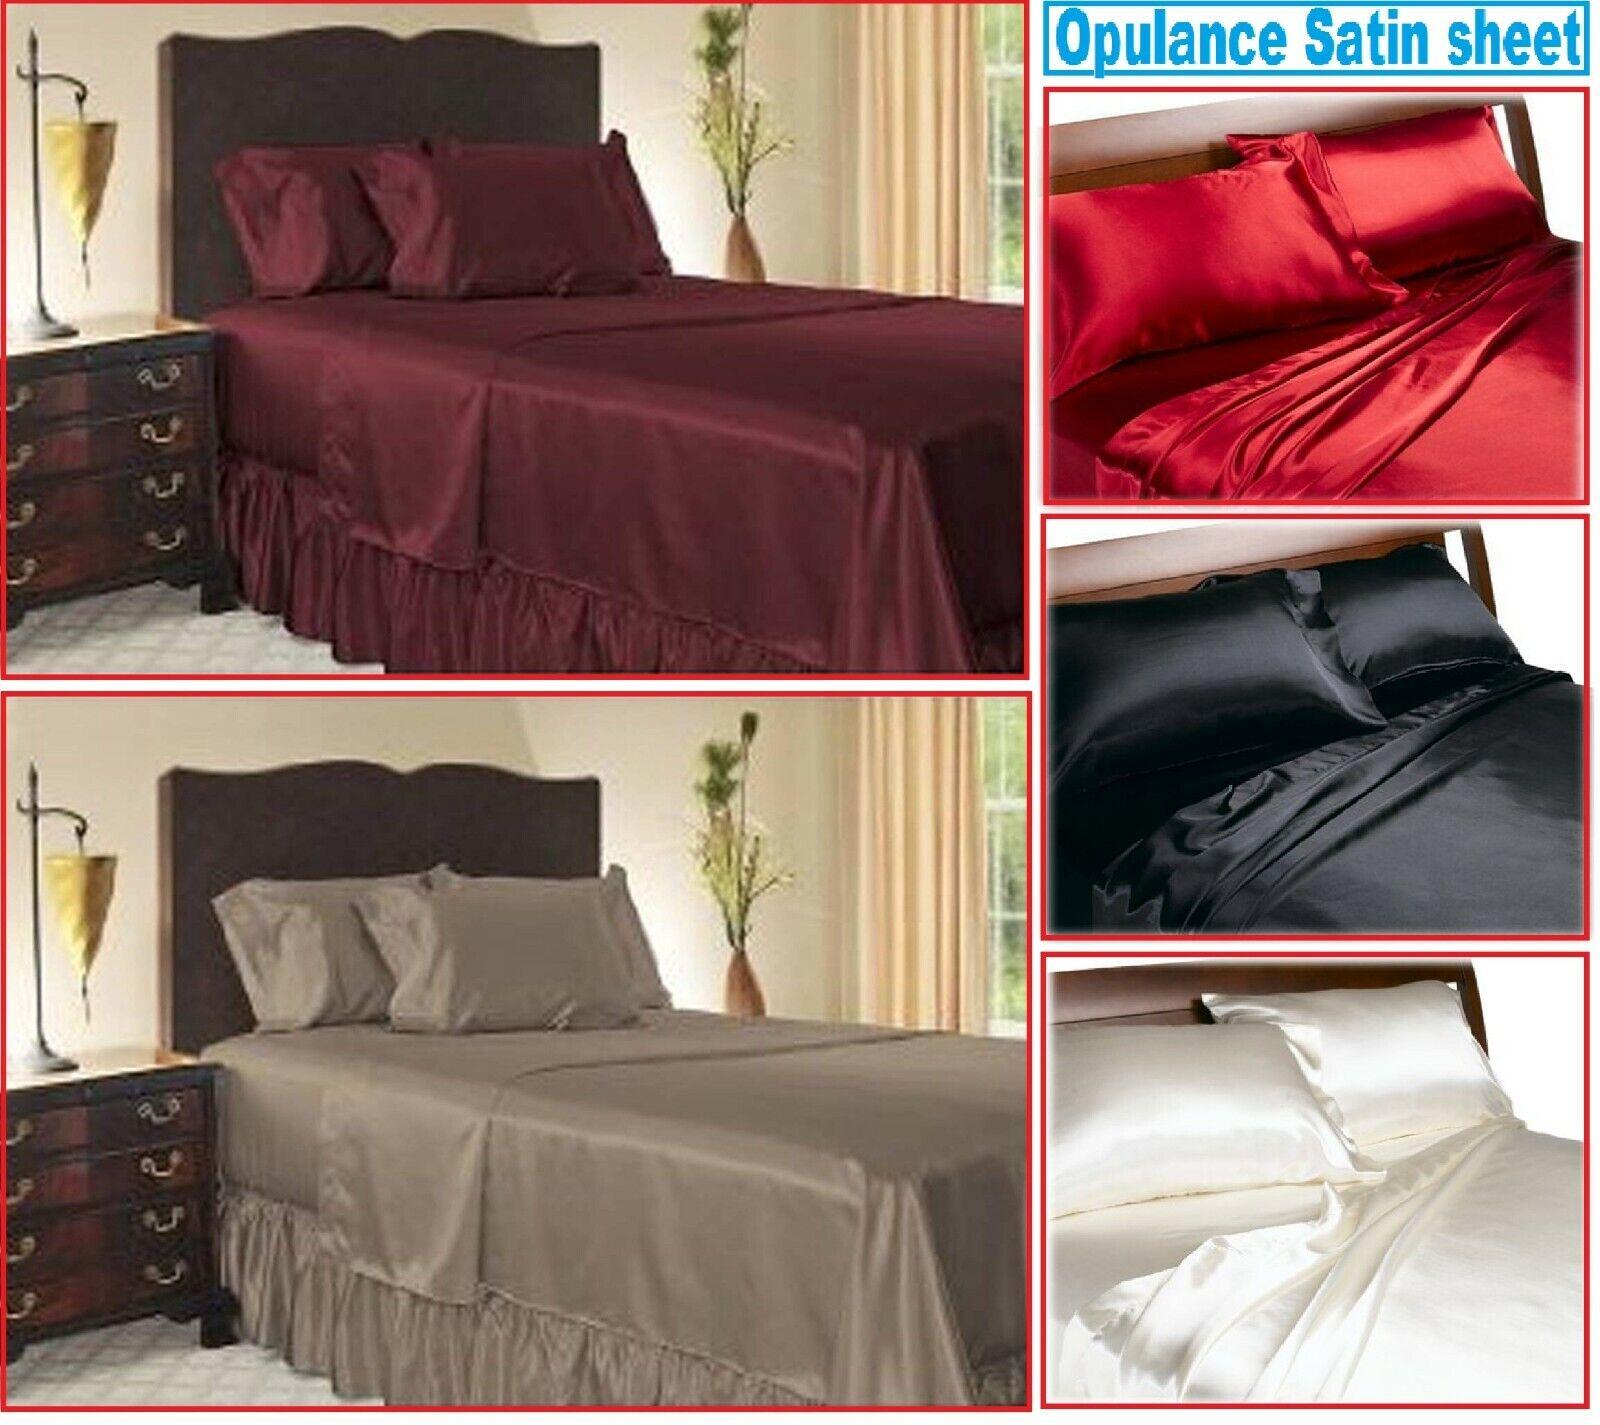 BLACK SATIN SHEETS QUEEN Size Soft Silk Feel Bedding 4pc Set Luxury Bed Linen